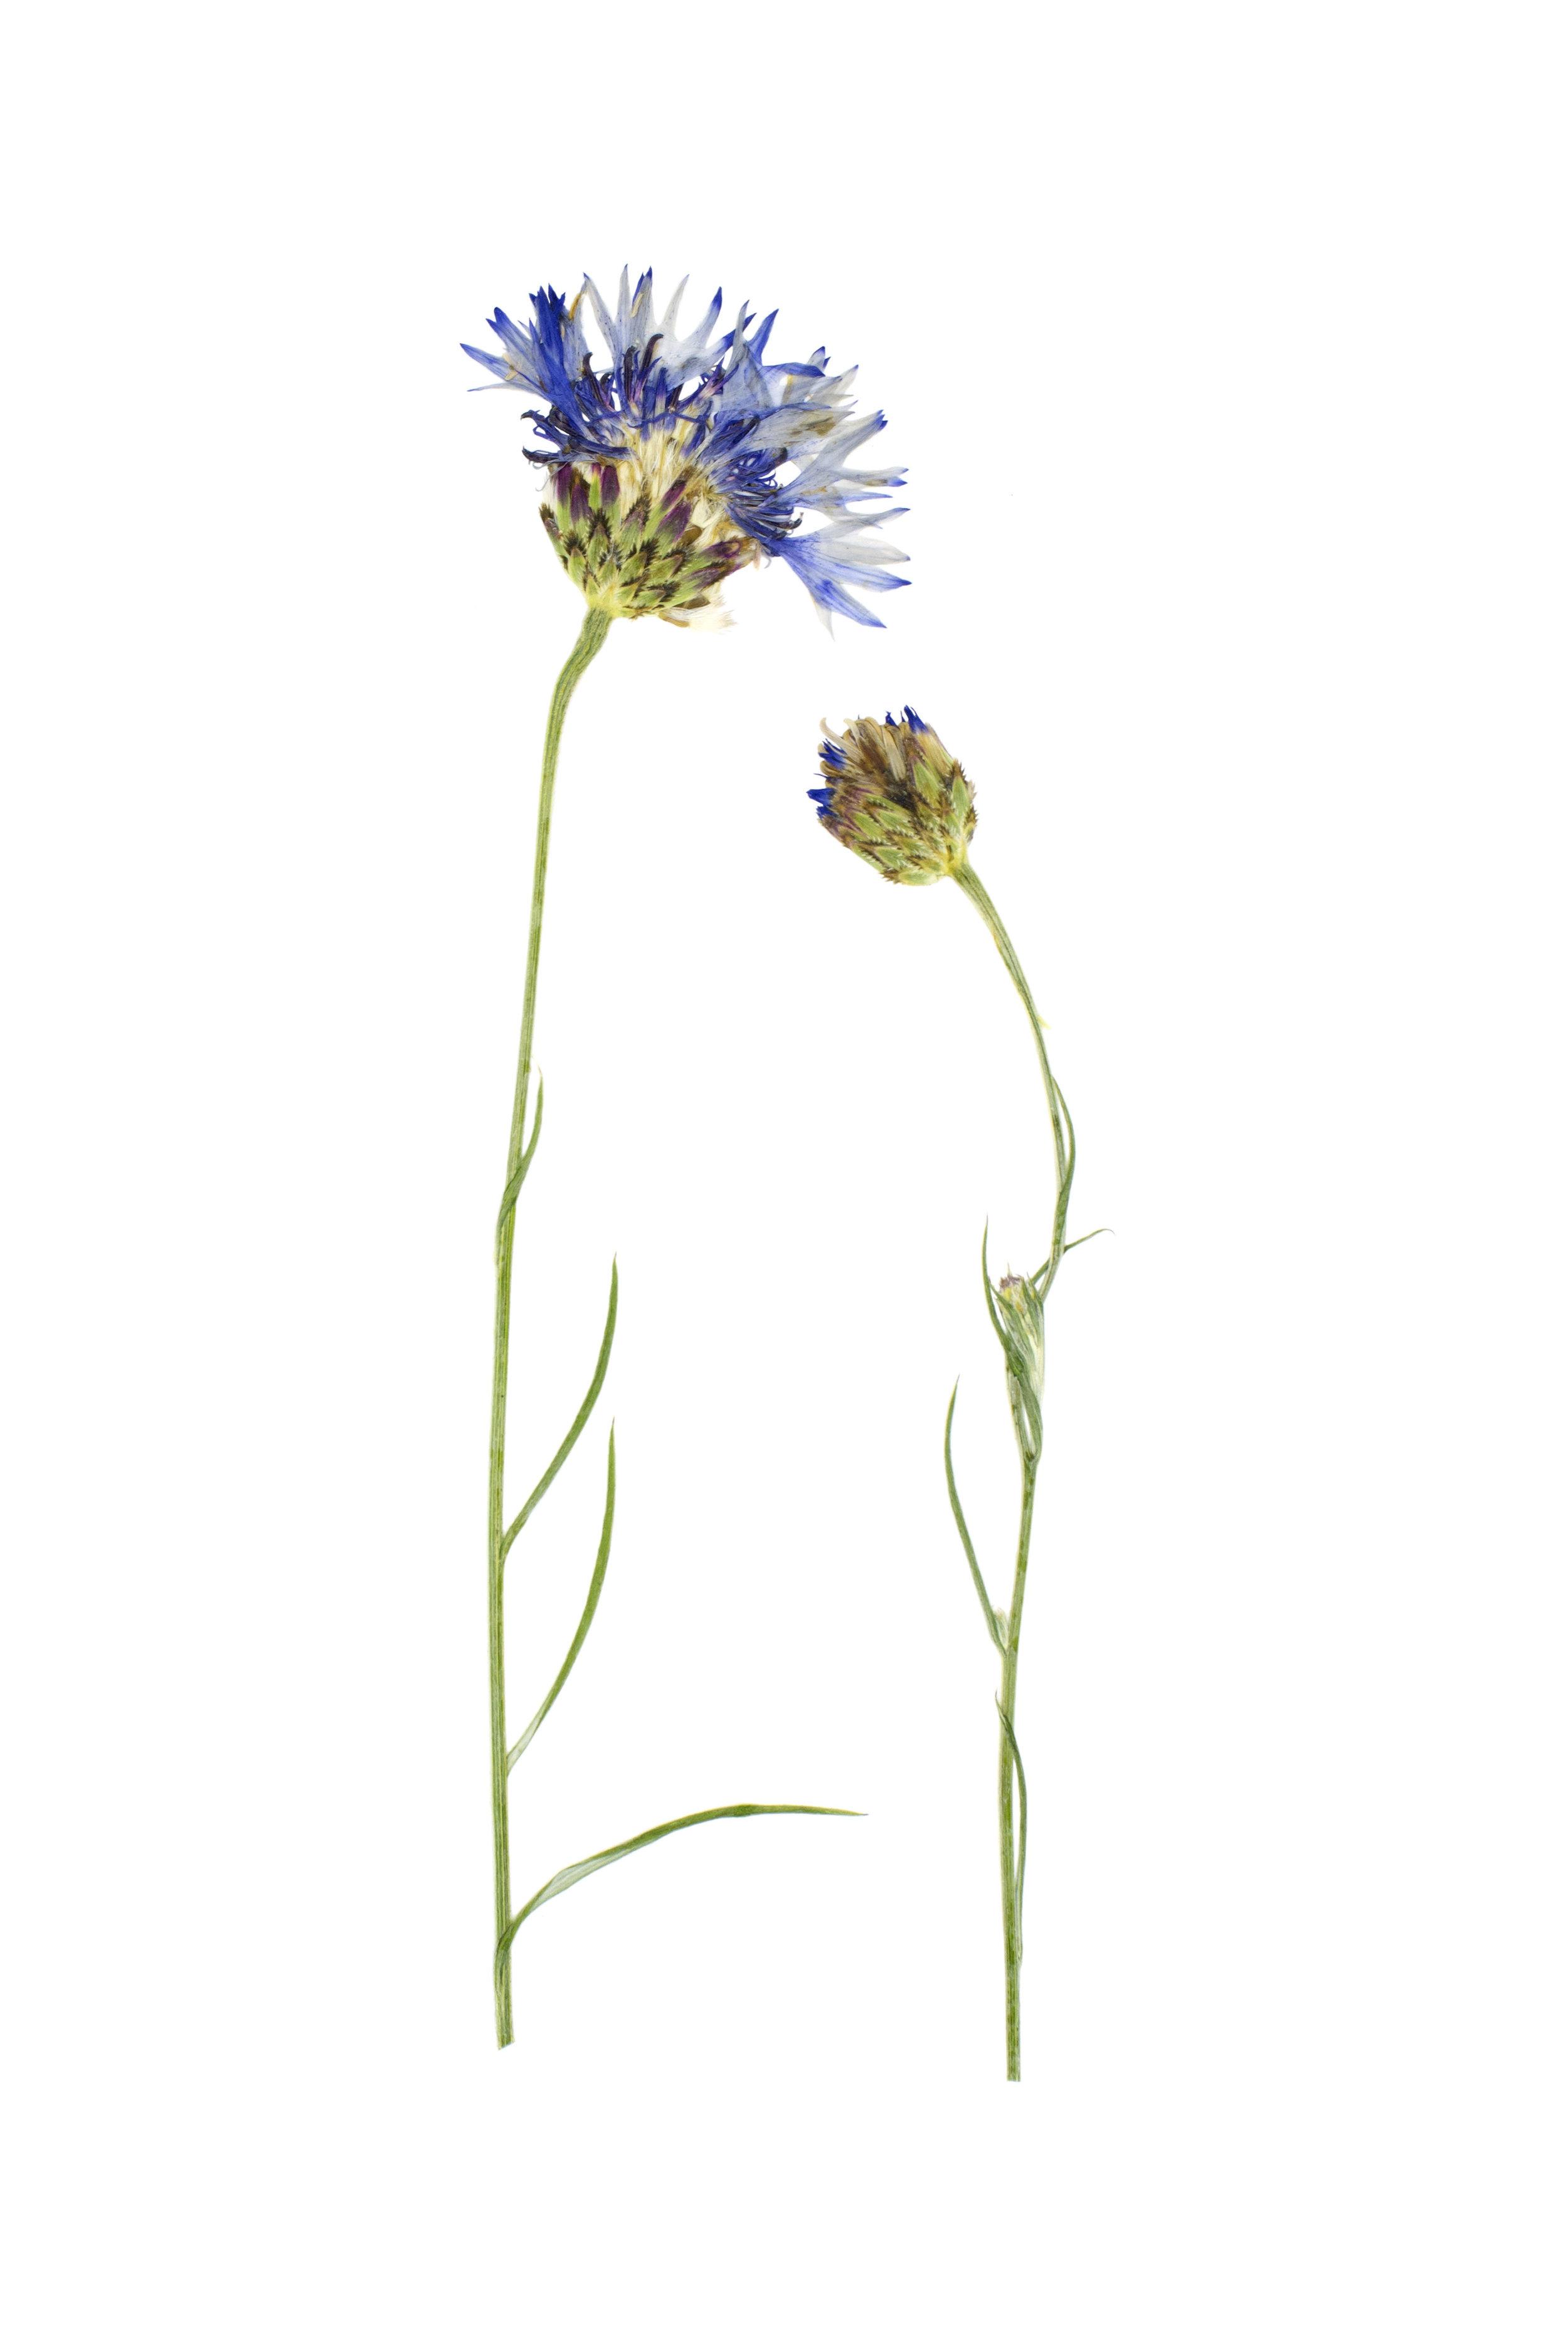 Cornflower / Centaurea cyanus